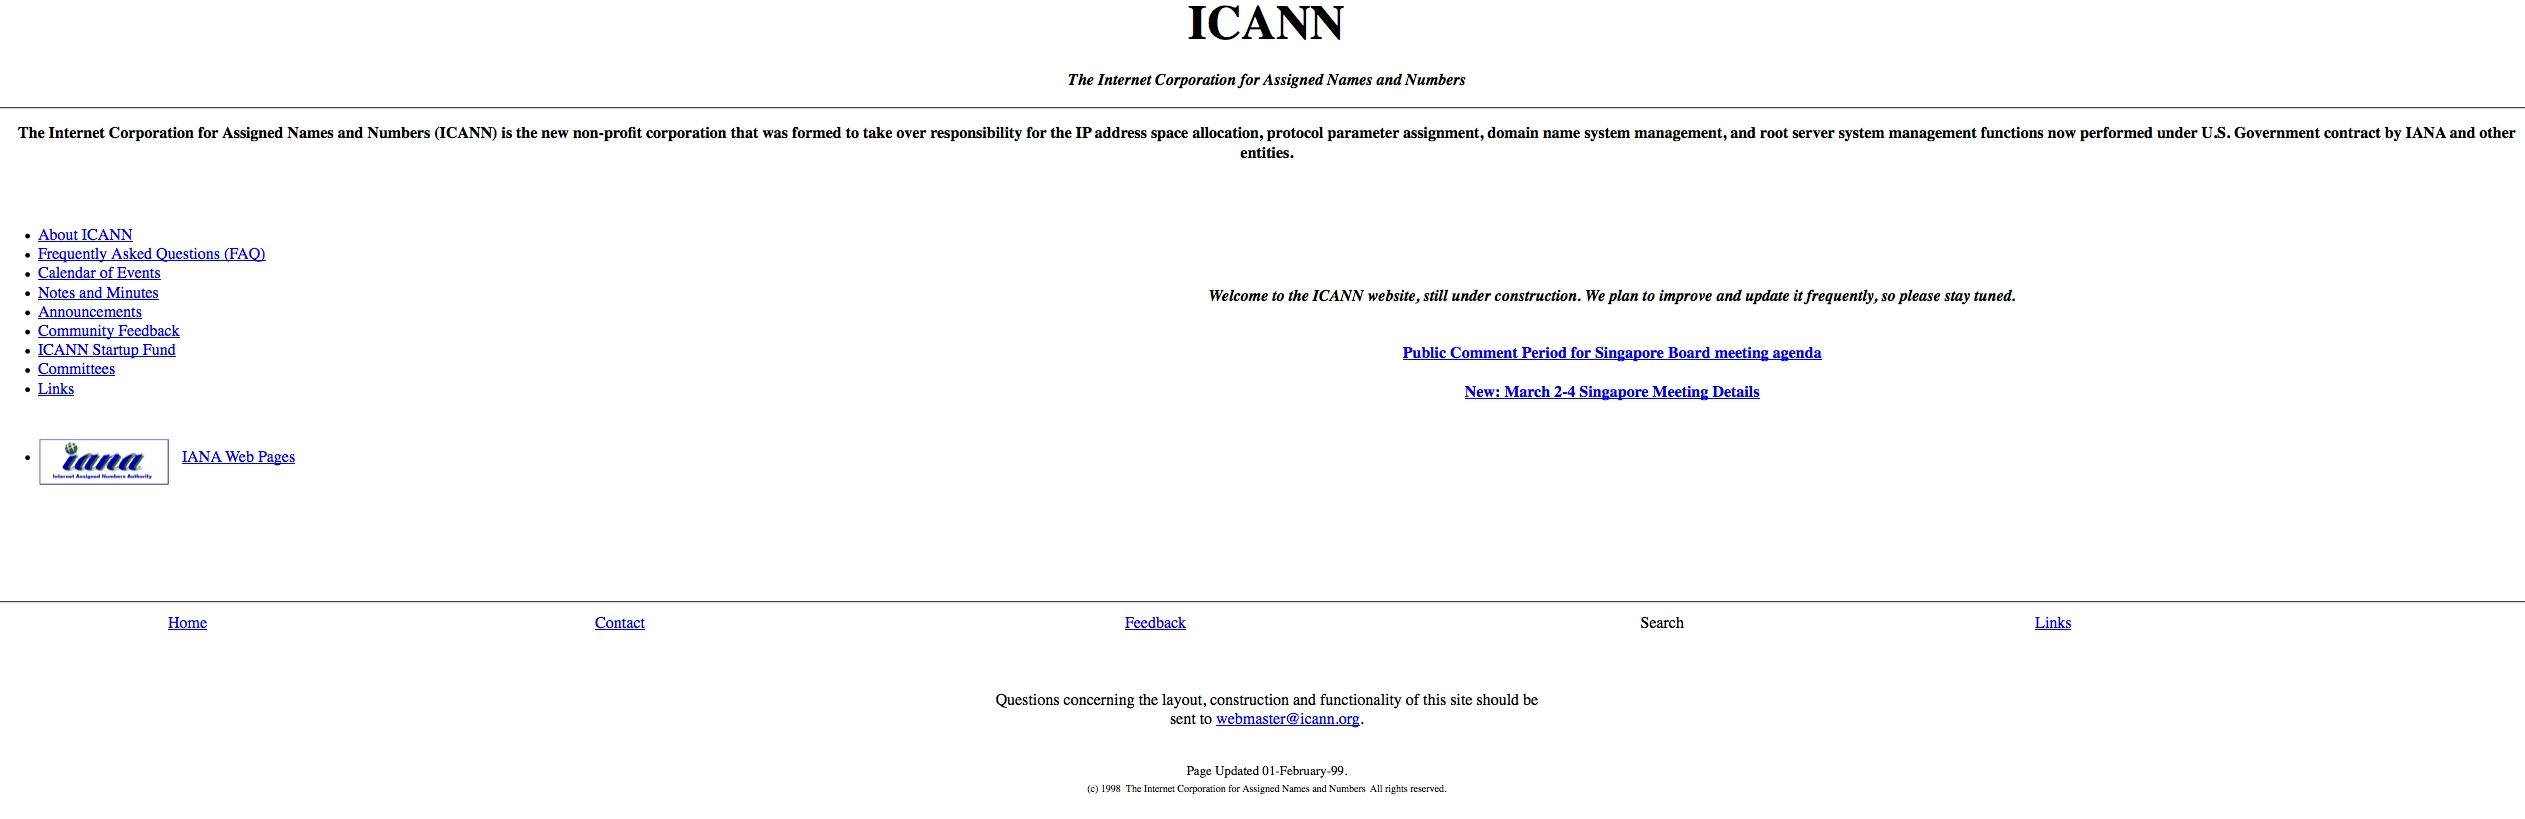 ICANN Site Gets Facelift